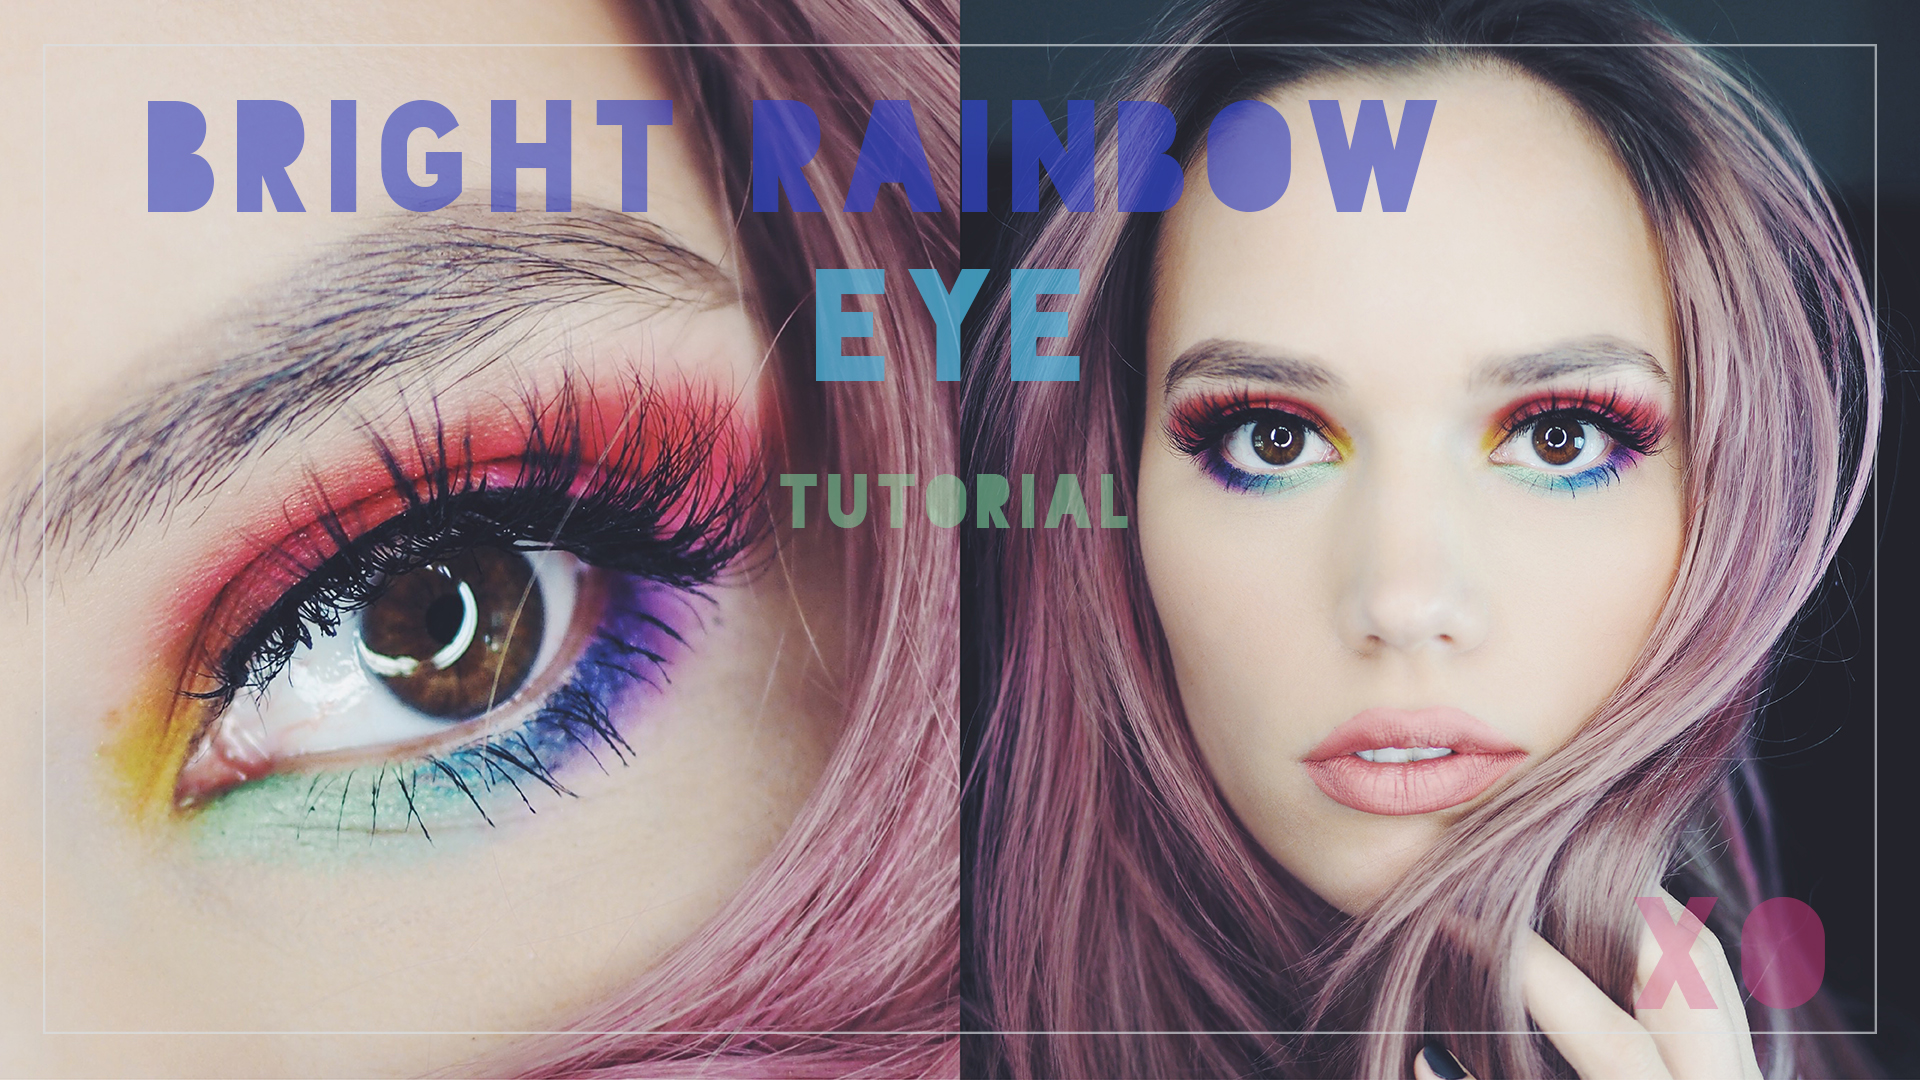 Bright rainbow eyes tutorial